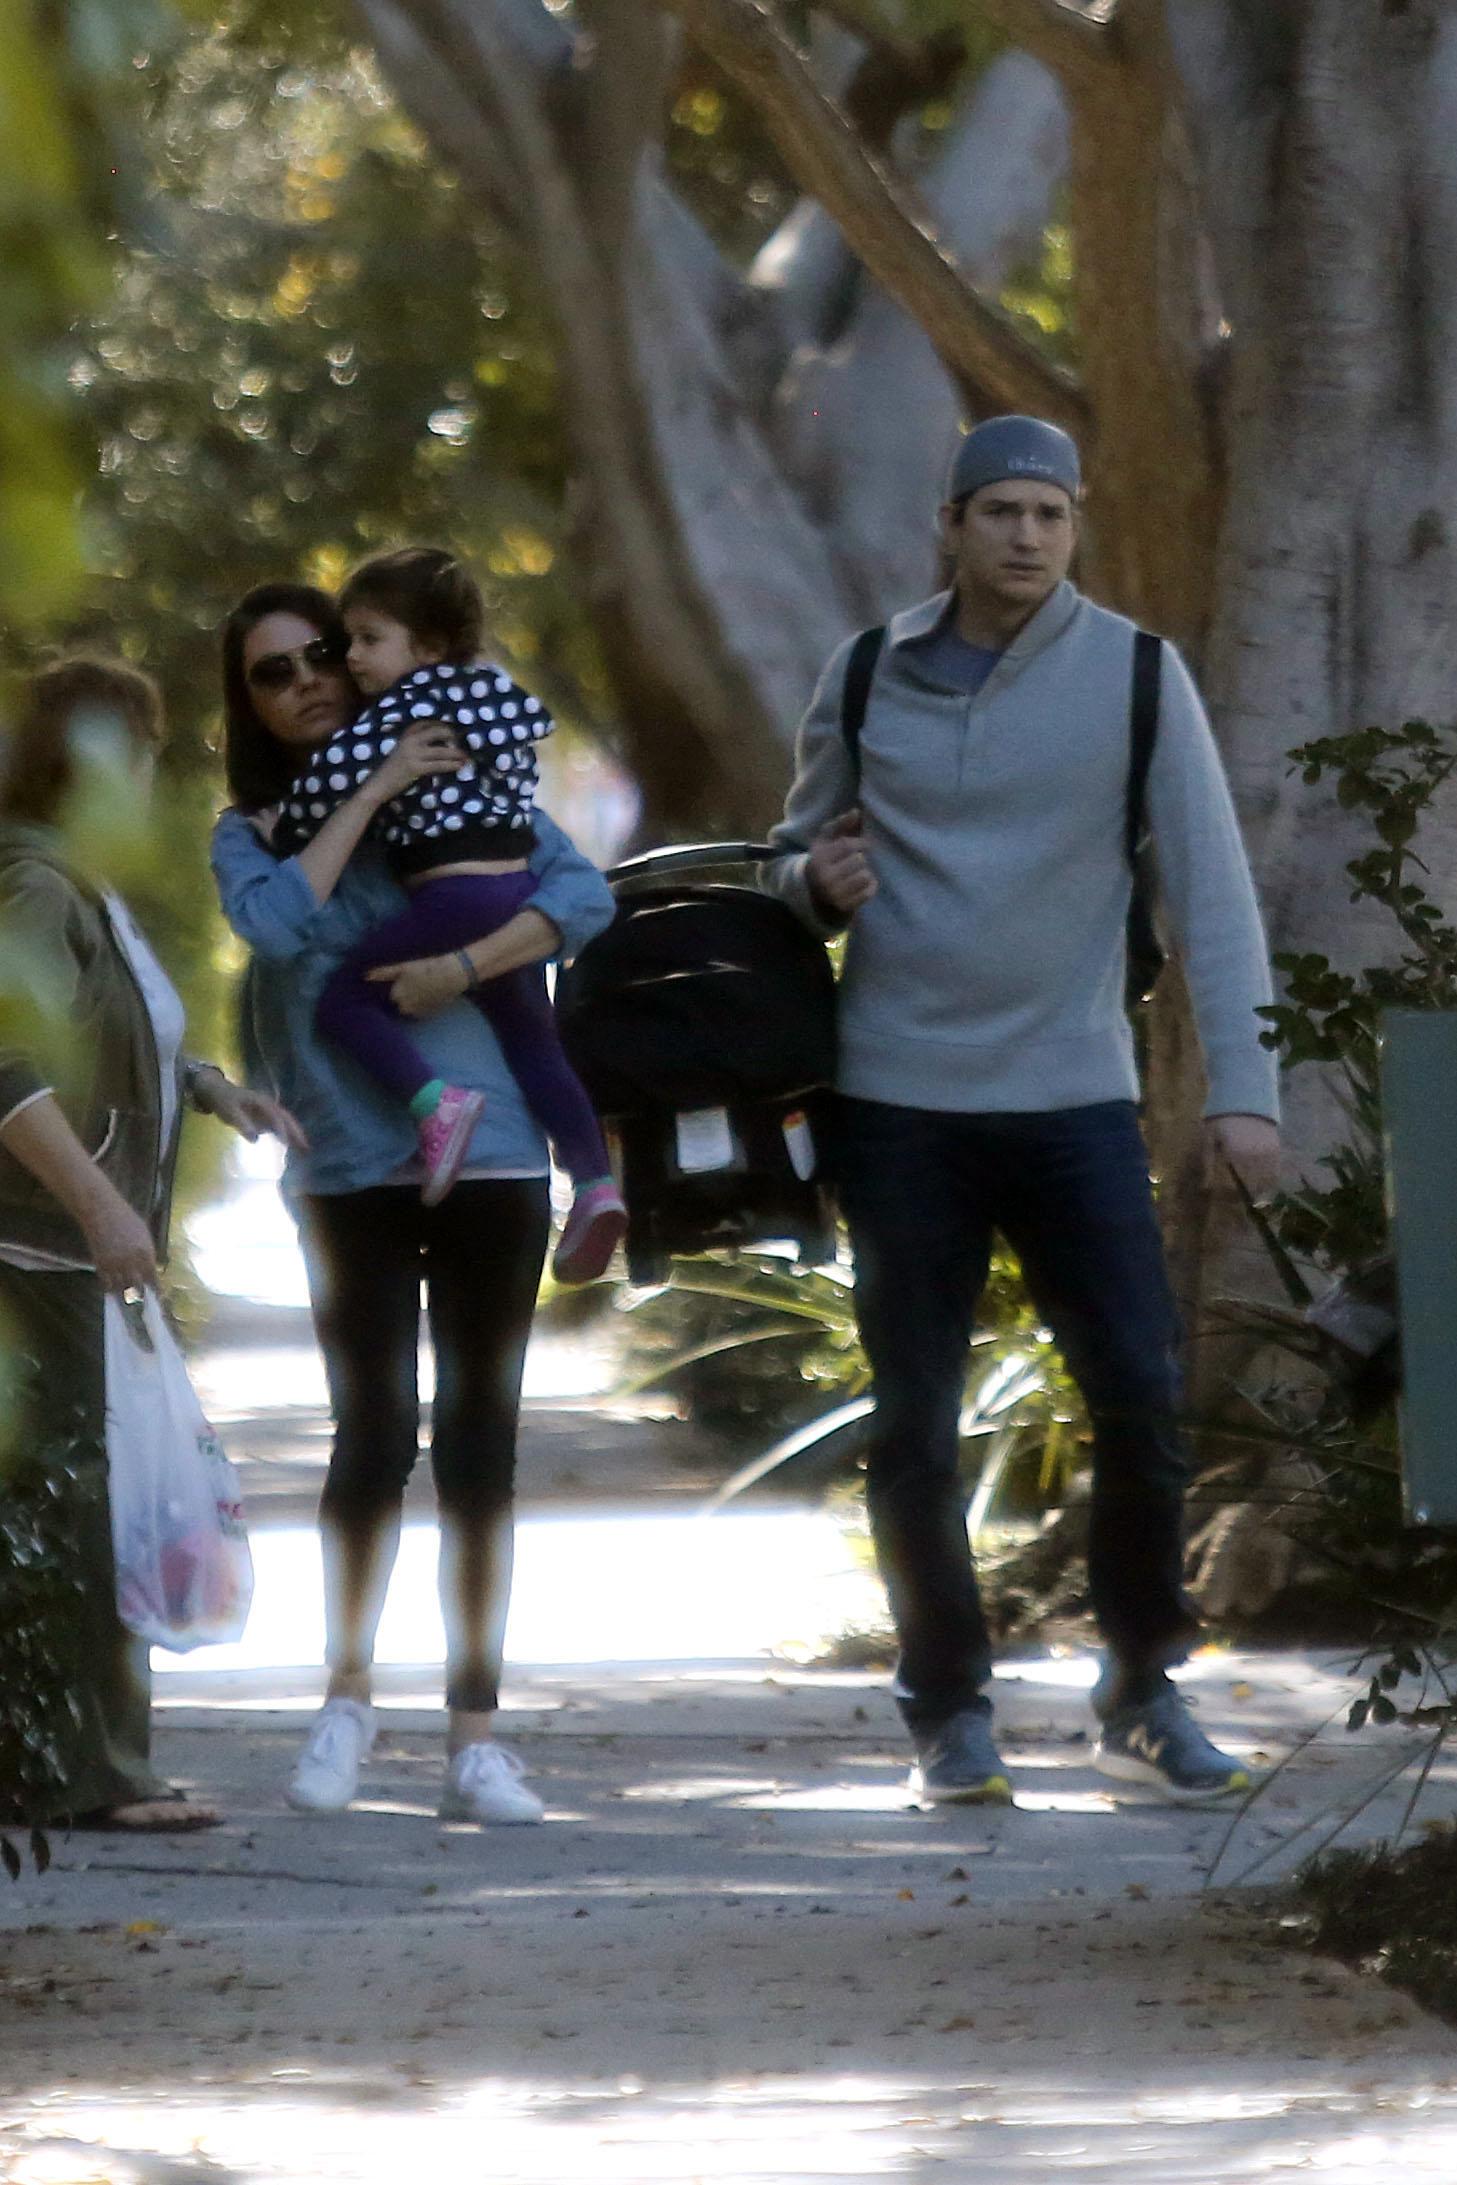 EXCLUSIVE Mila Kunis And Ashton Kutcher Enjoy A Full Family Day Out